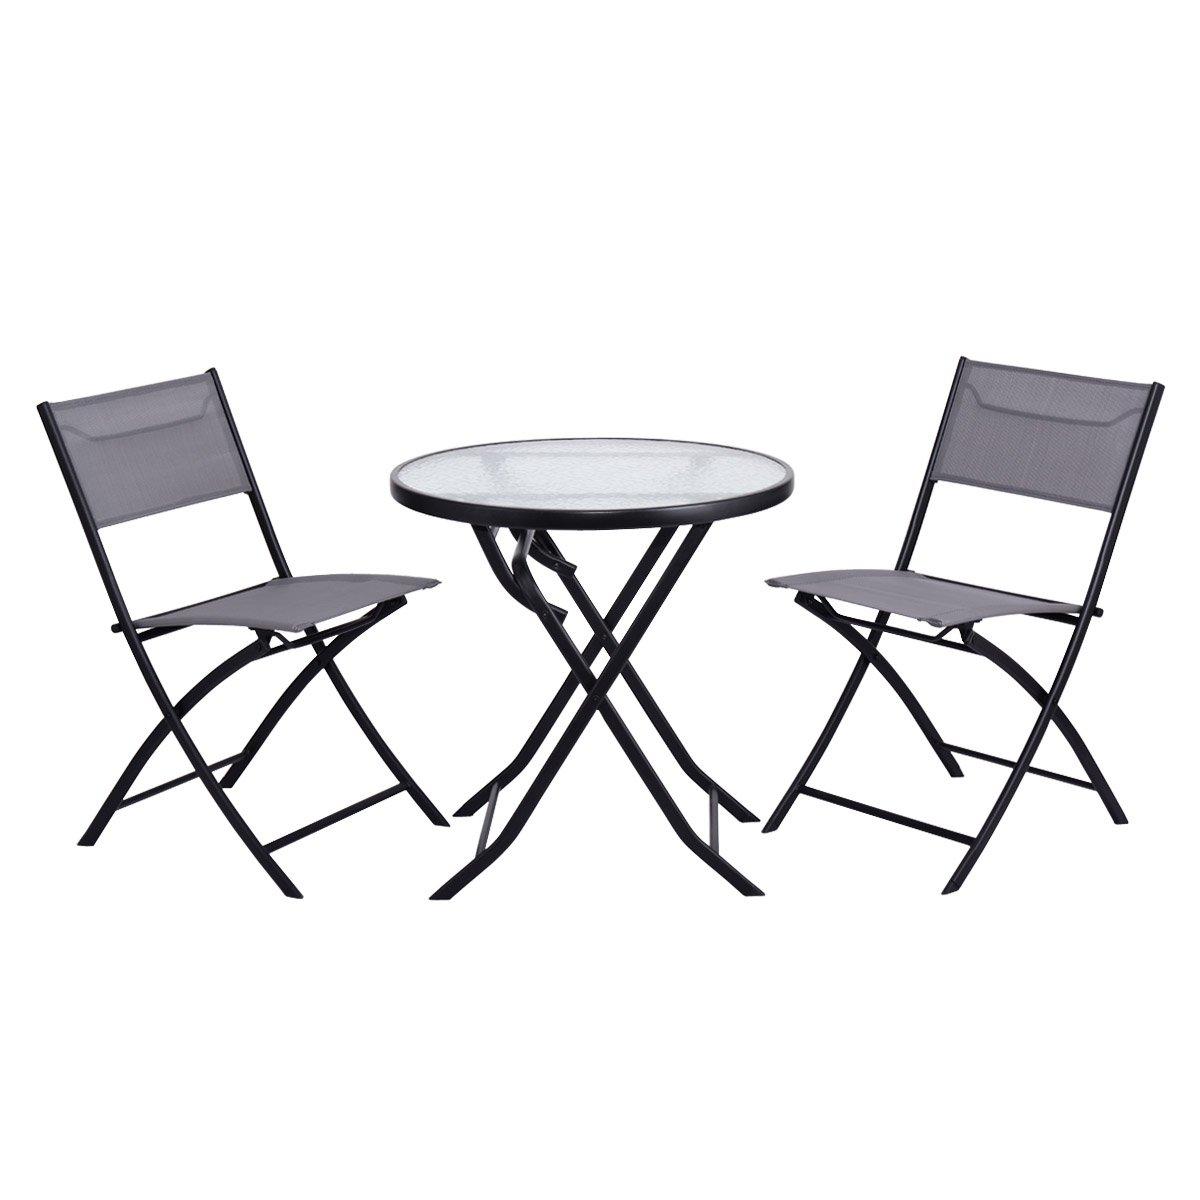 Giantex 3 Piece Table Chair Set Metal Tempered Glass Folding Outdoor Patio Garden Pool (Blue)